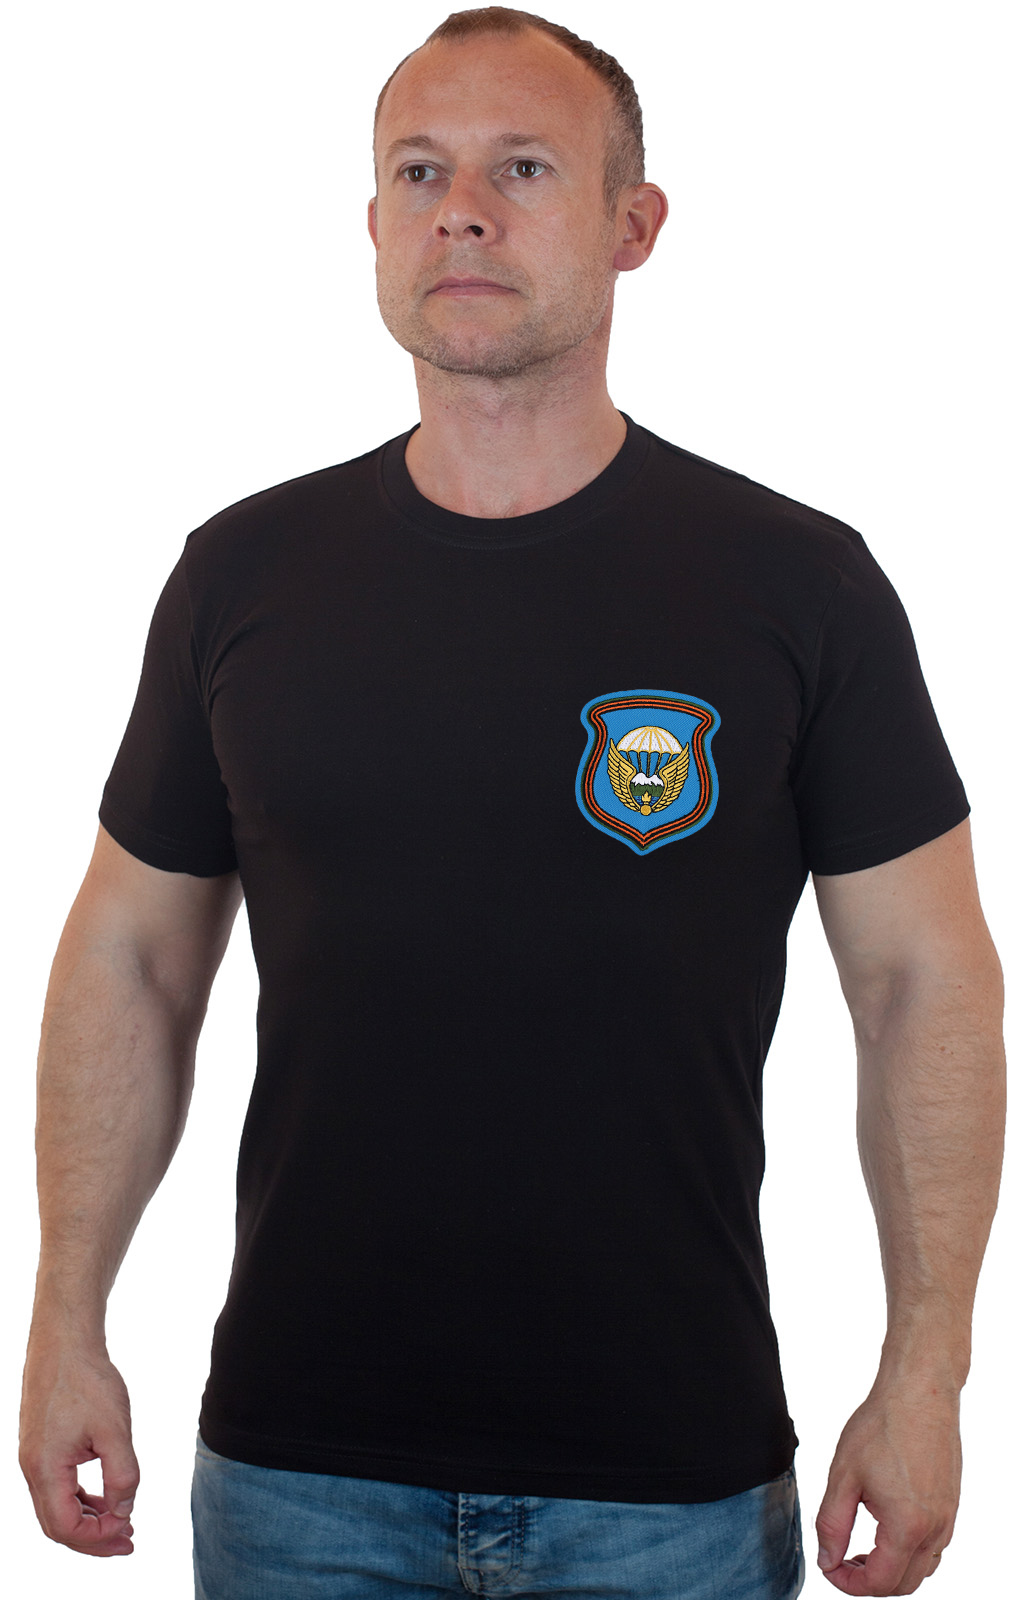 Символика 7 гв. ДШД на мужских футболках